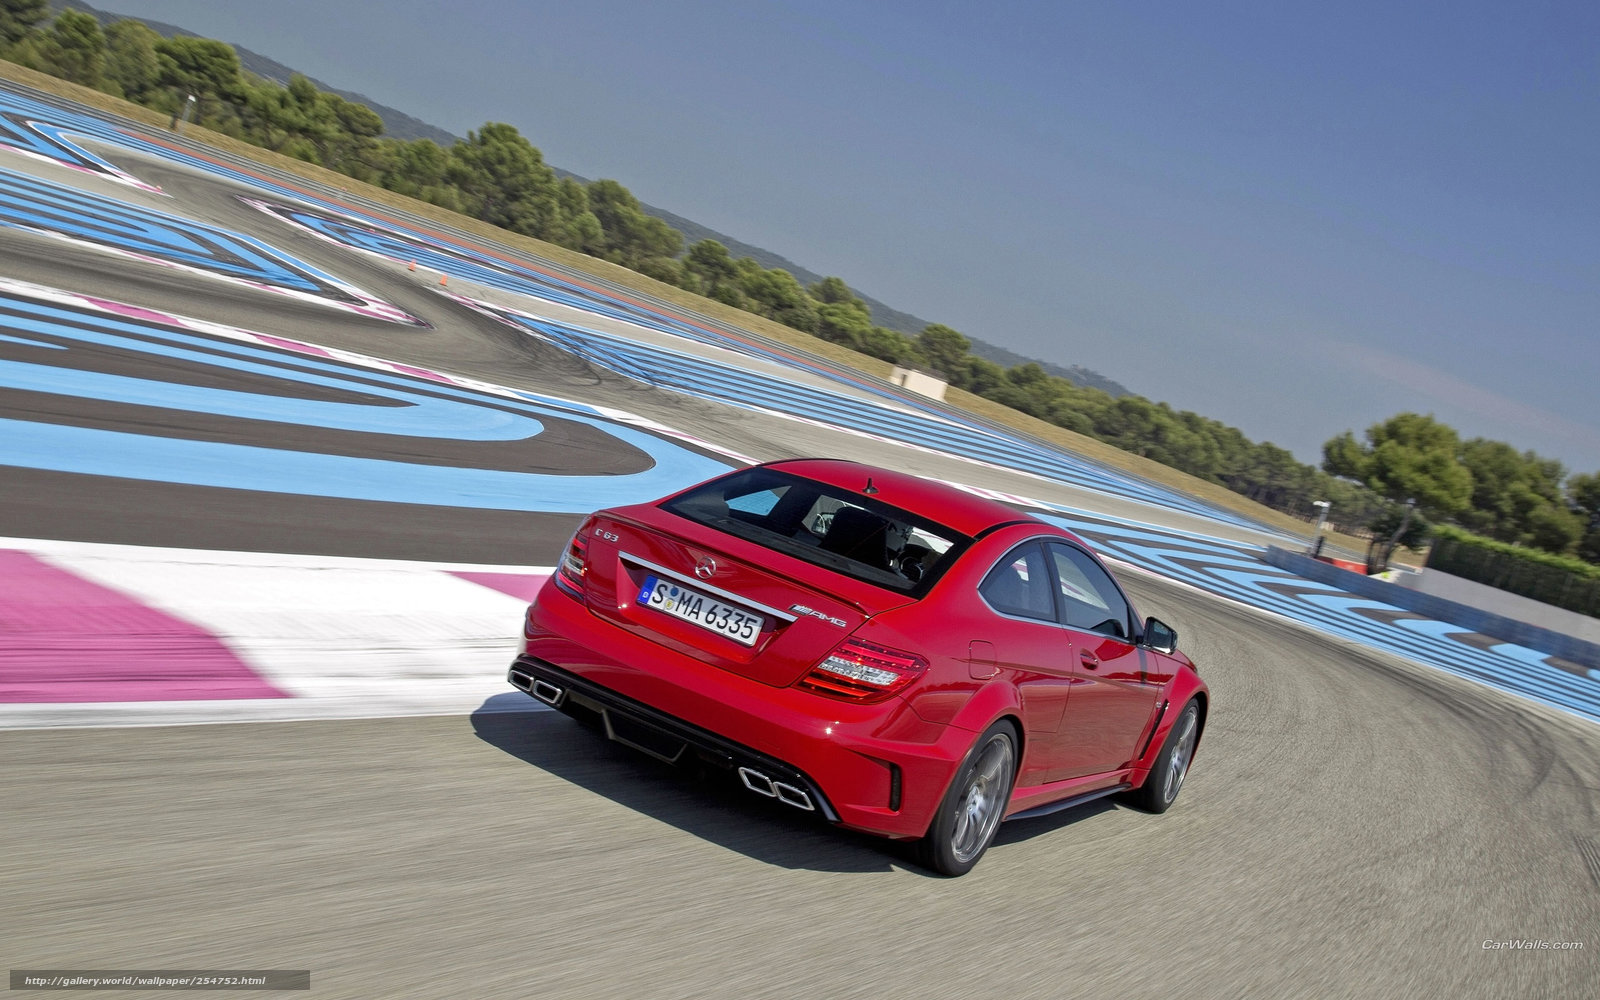 Download wallpaper mercedes benz c class car machinery for Mercedes benz alhambra